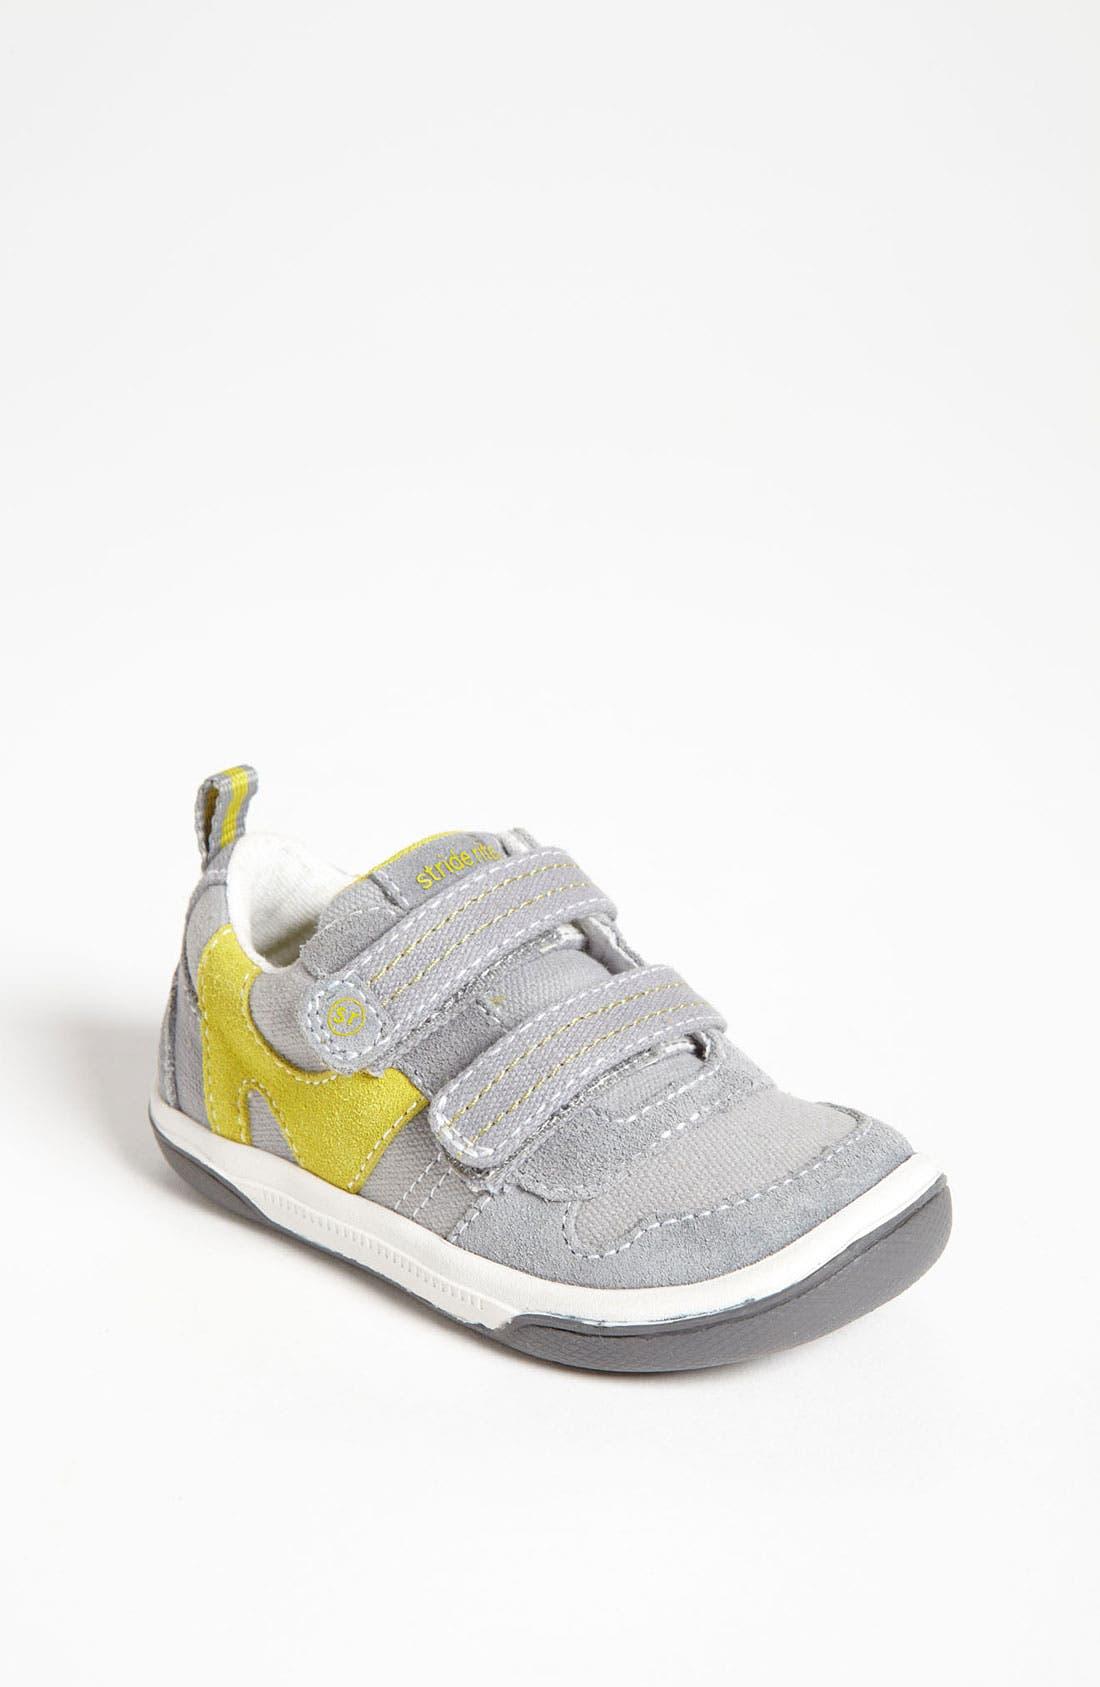 Alternate Image 1 Selected - Stride Rite 'Jamison' Sneaker (Baby, Walker & Toddler)